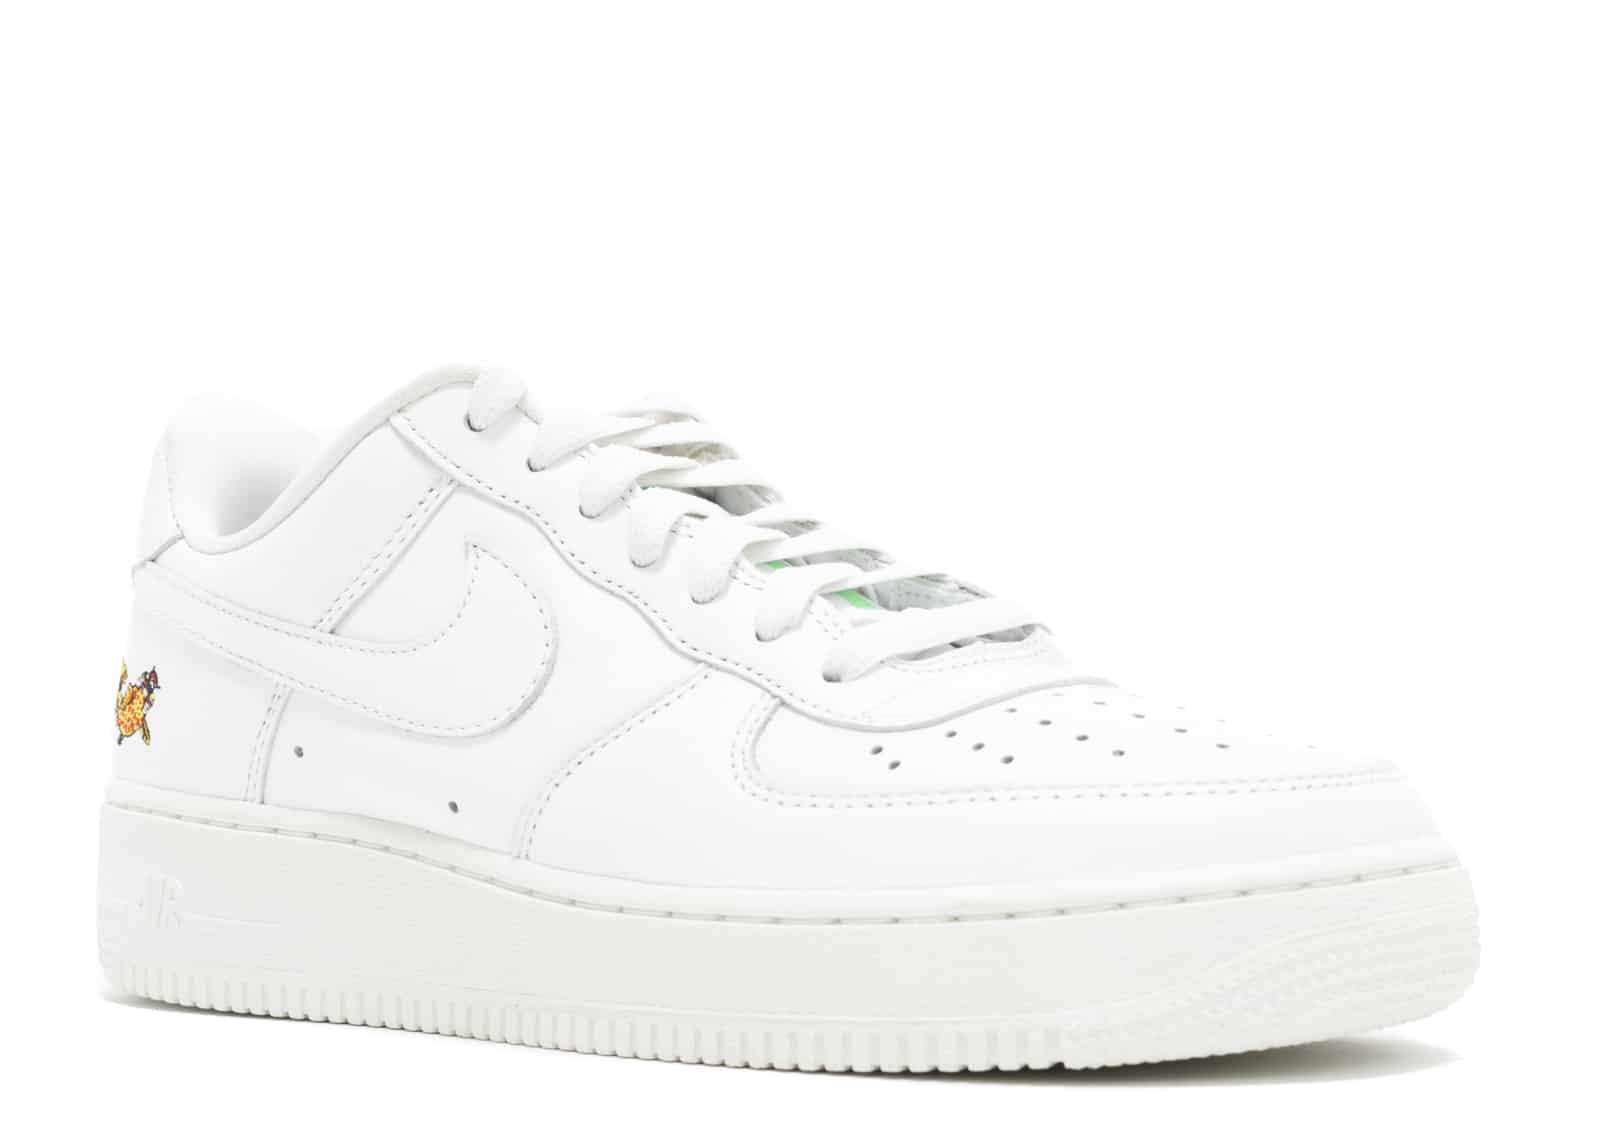 Nike's Air Force 1 NAI KE Goes